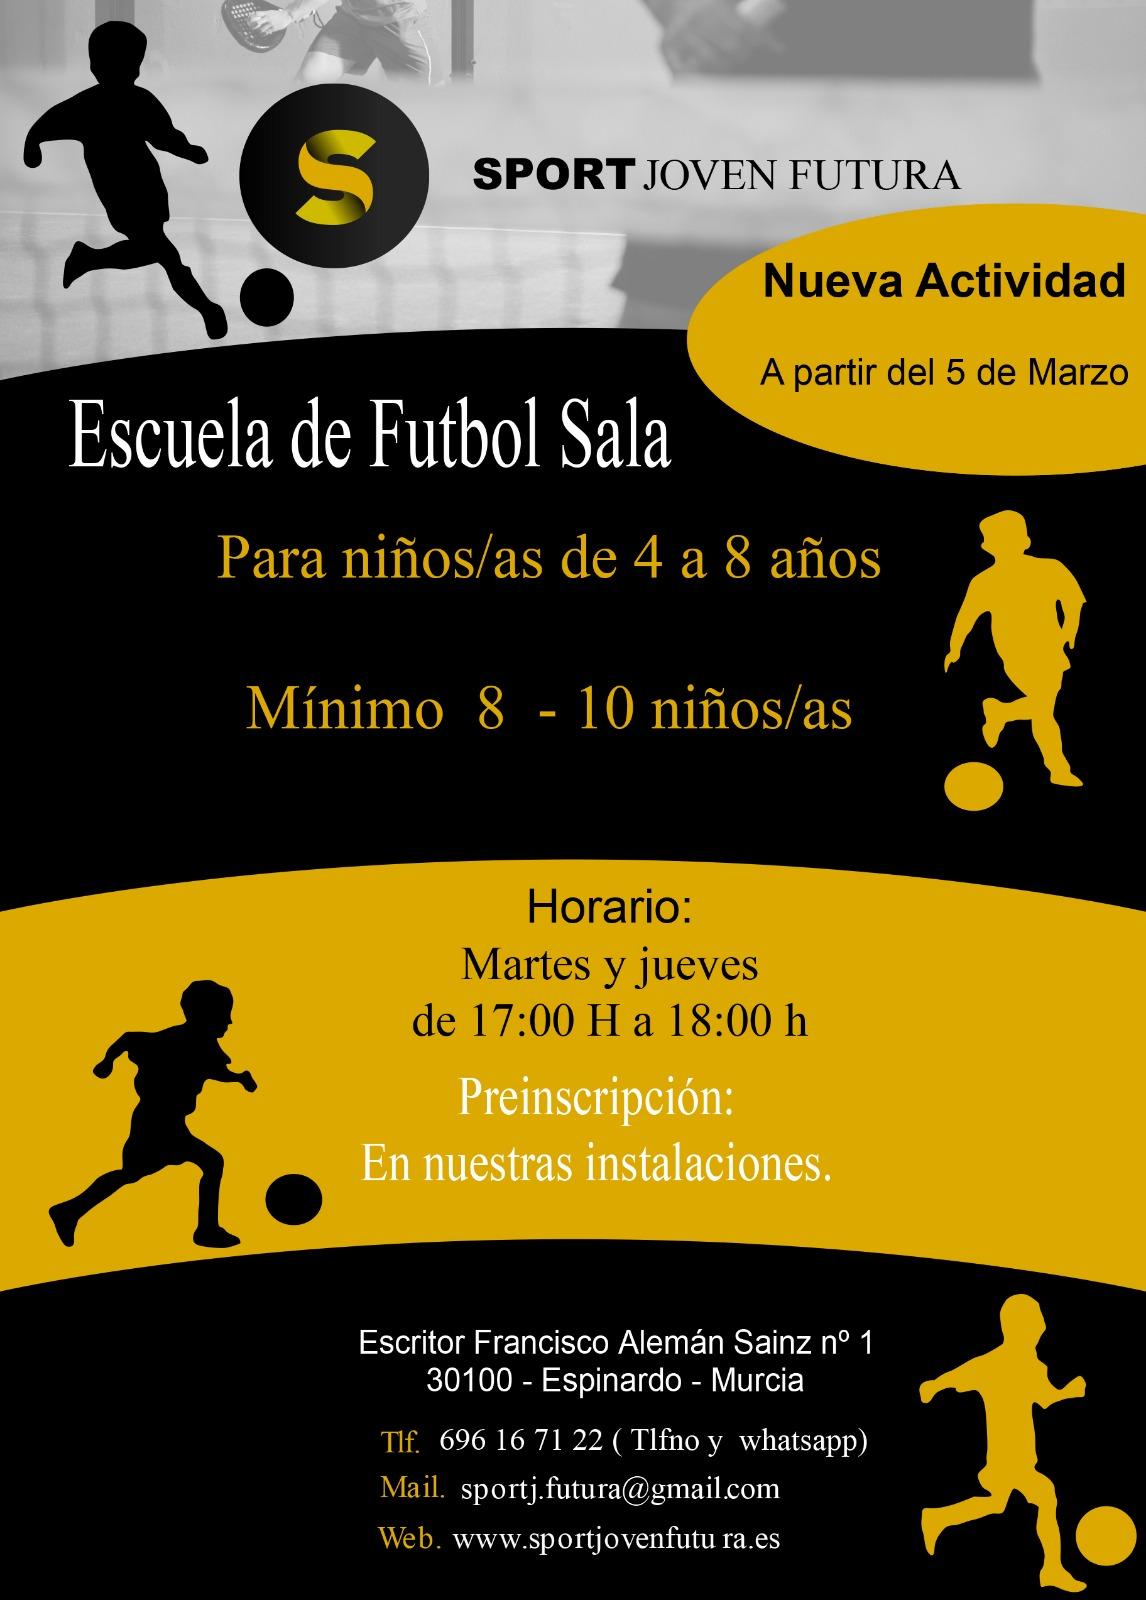 Escuela Fútbol Sala Sport Joven Futura